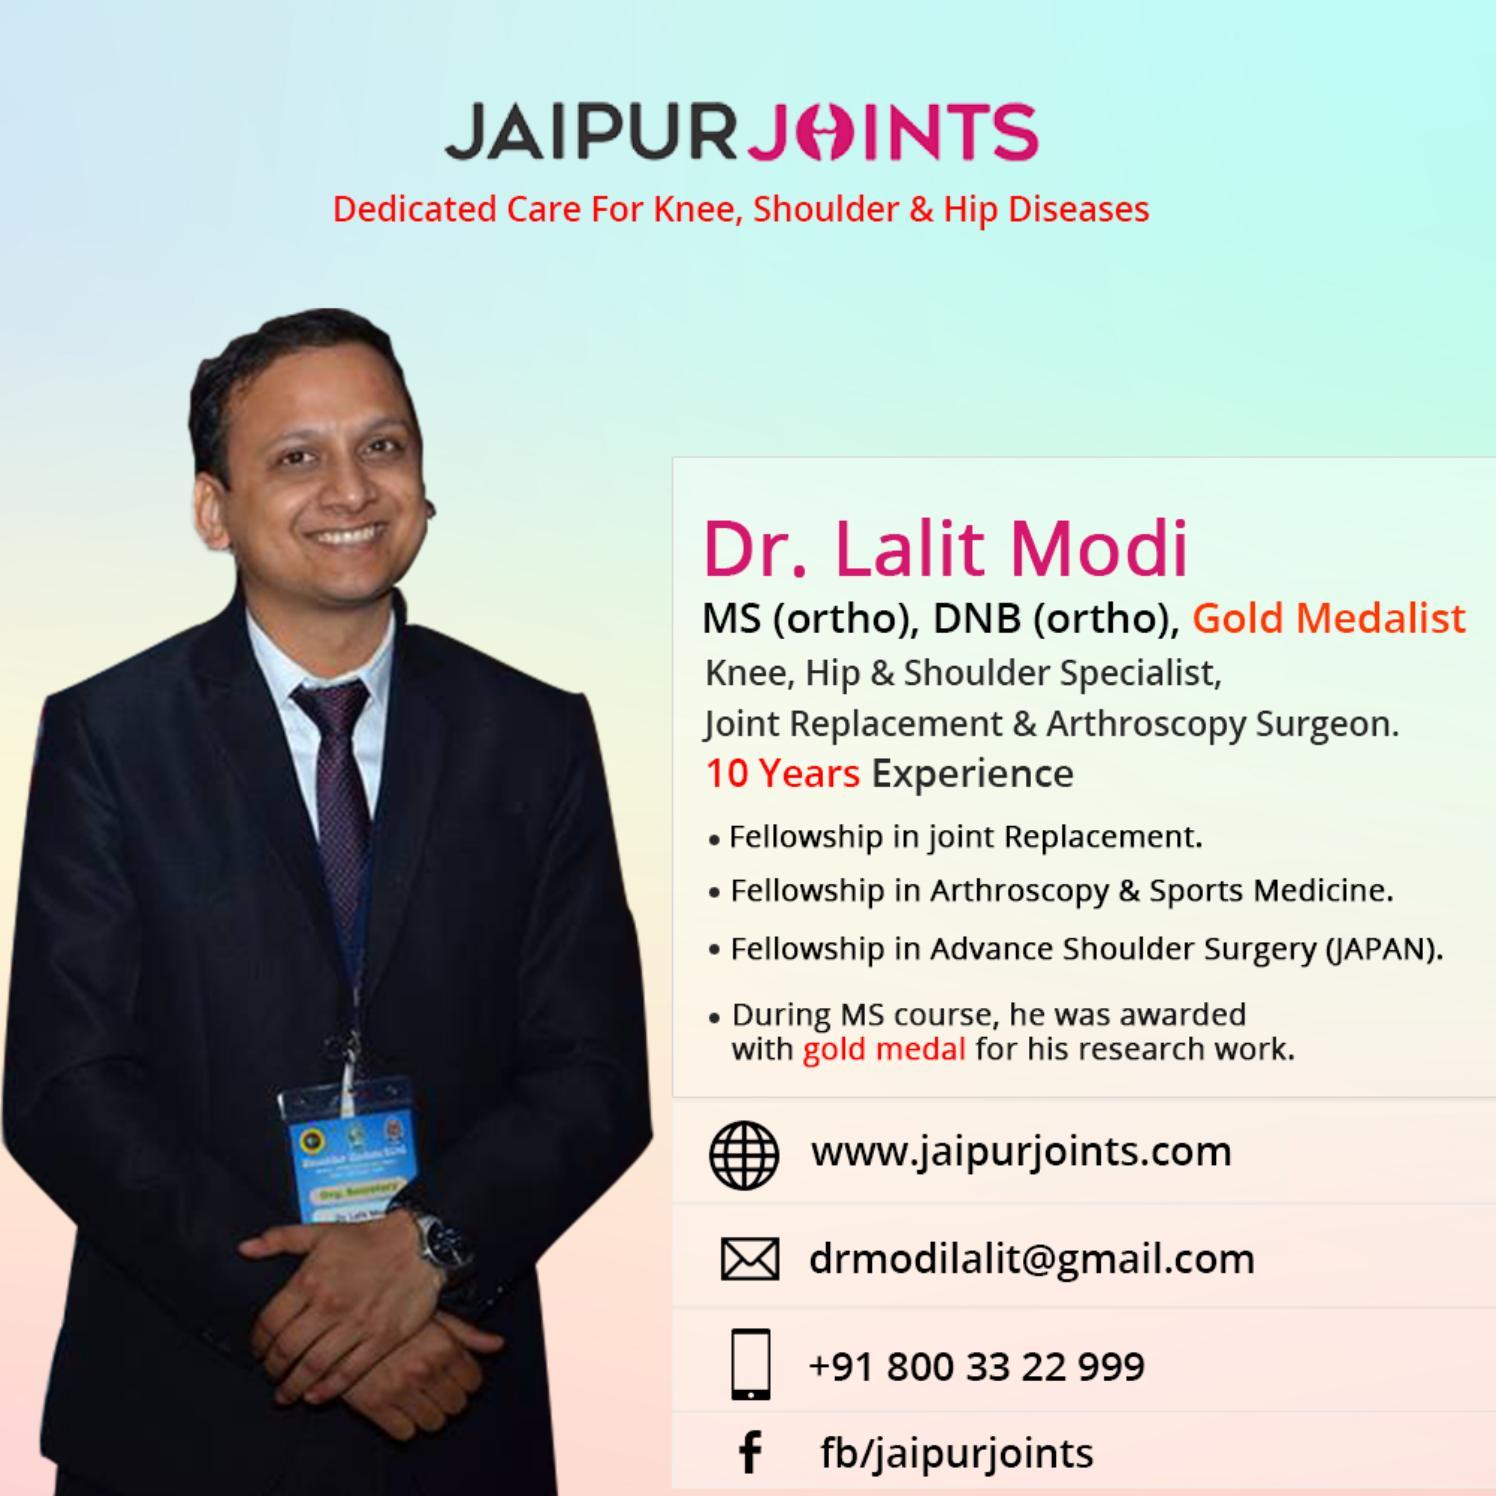 Best Orthopedic Surgeon in Jaipur   Dr. Lalit Modi